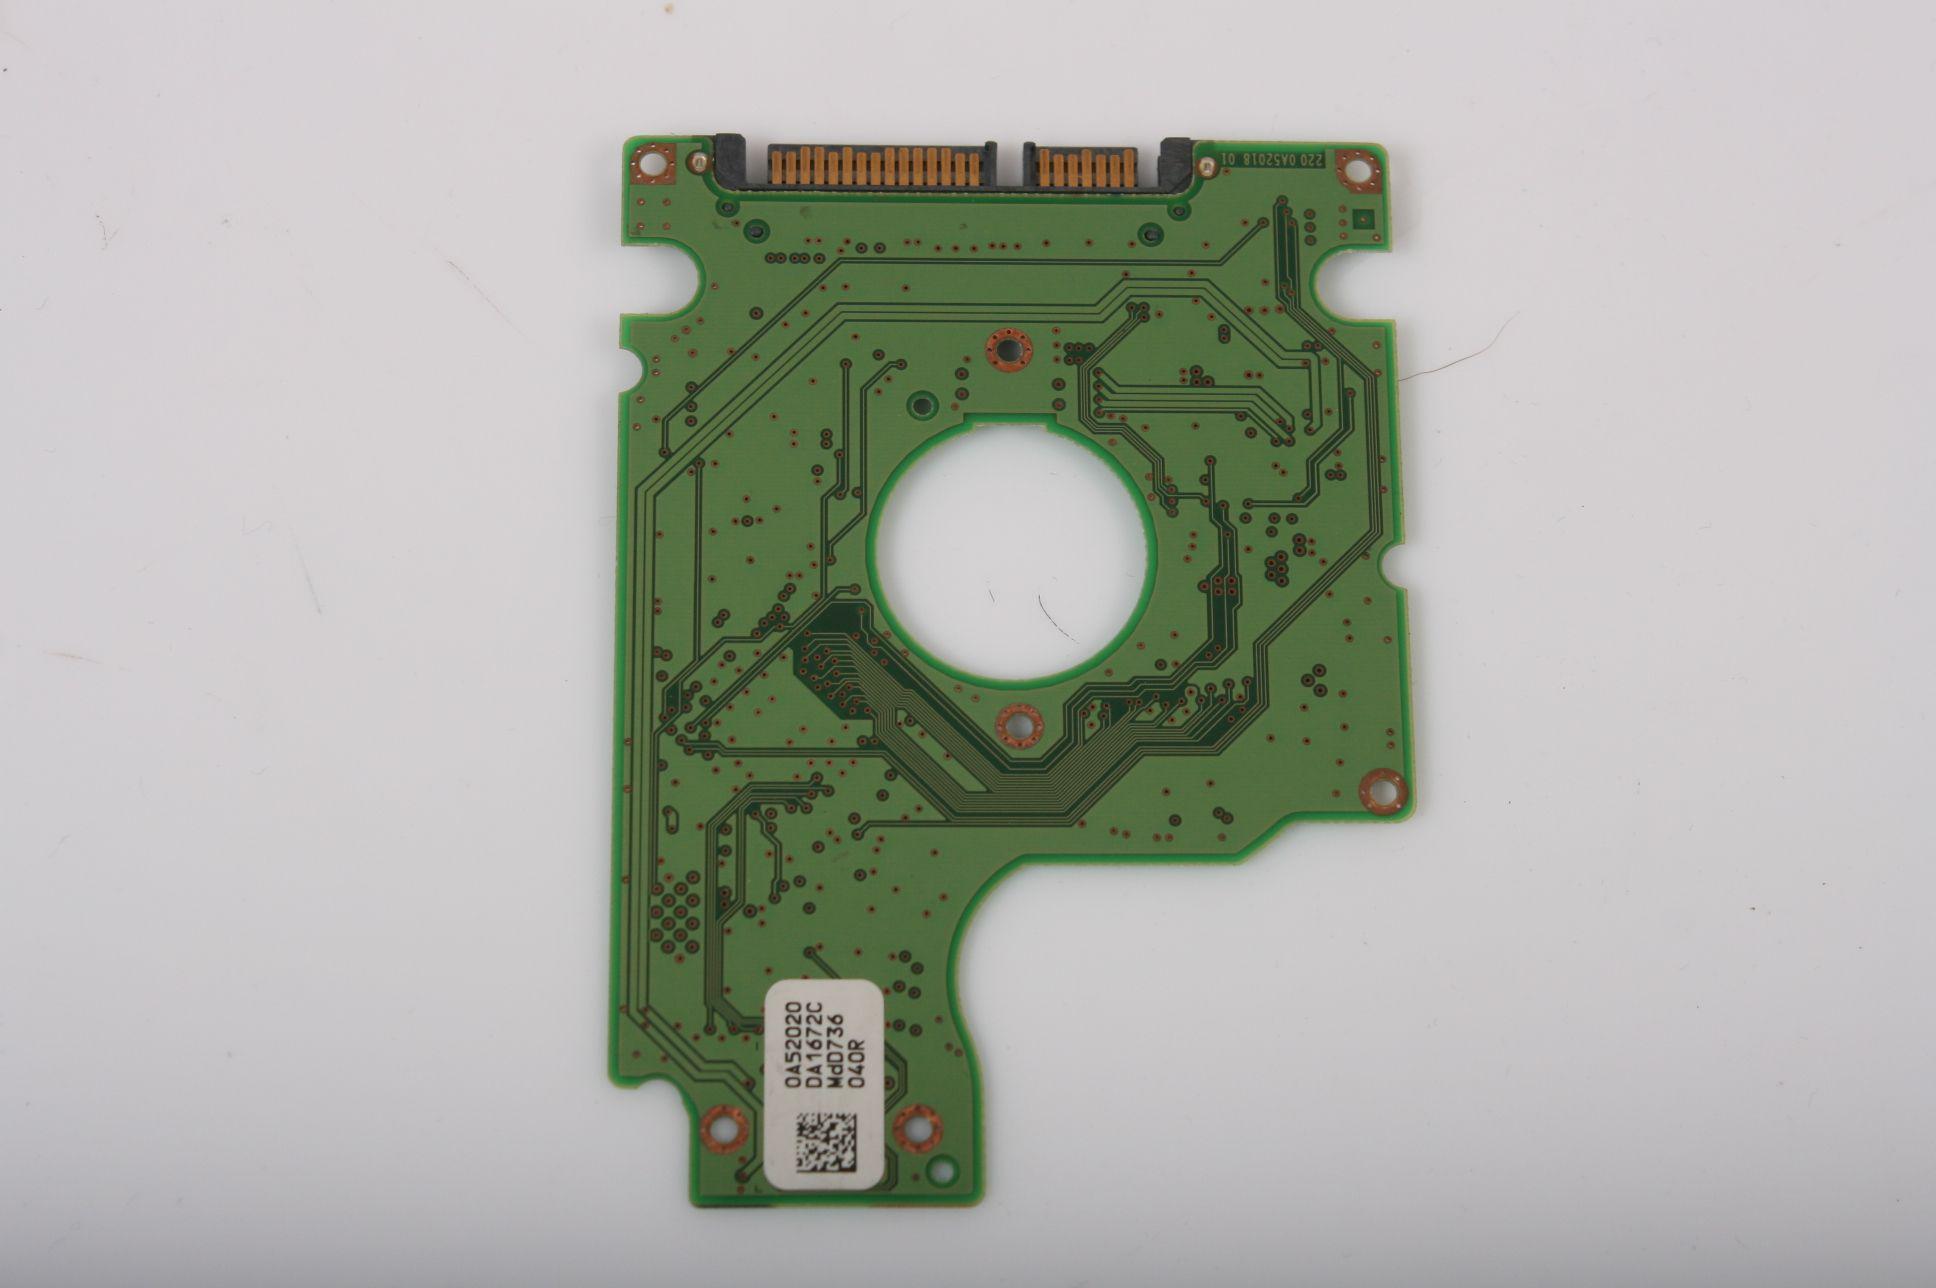 HITACHI HTS541612J9SA00 120GB 2,5 SATA HARD DRIVE / PCB (CIRCUIT BOARD) ONLY FOR DATA